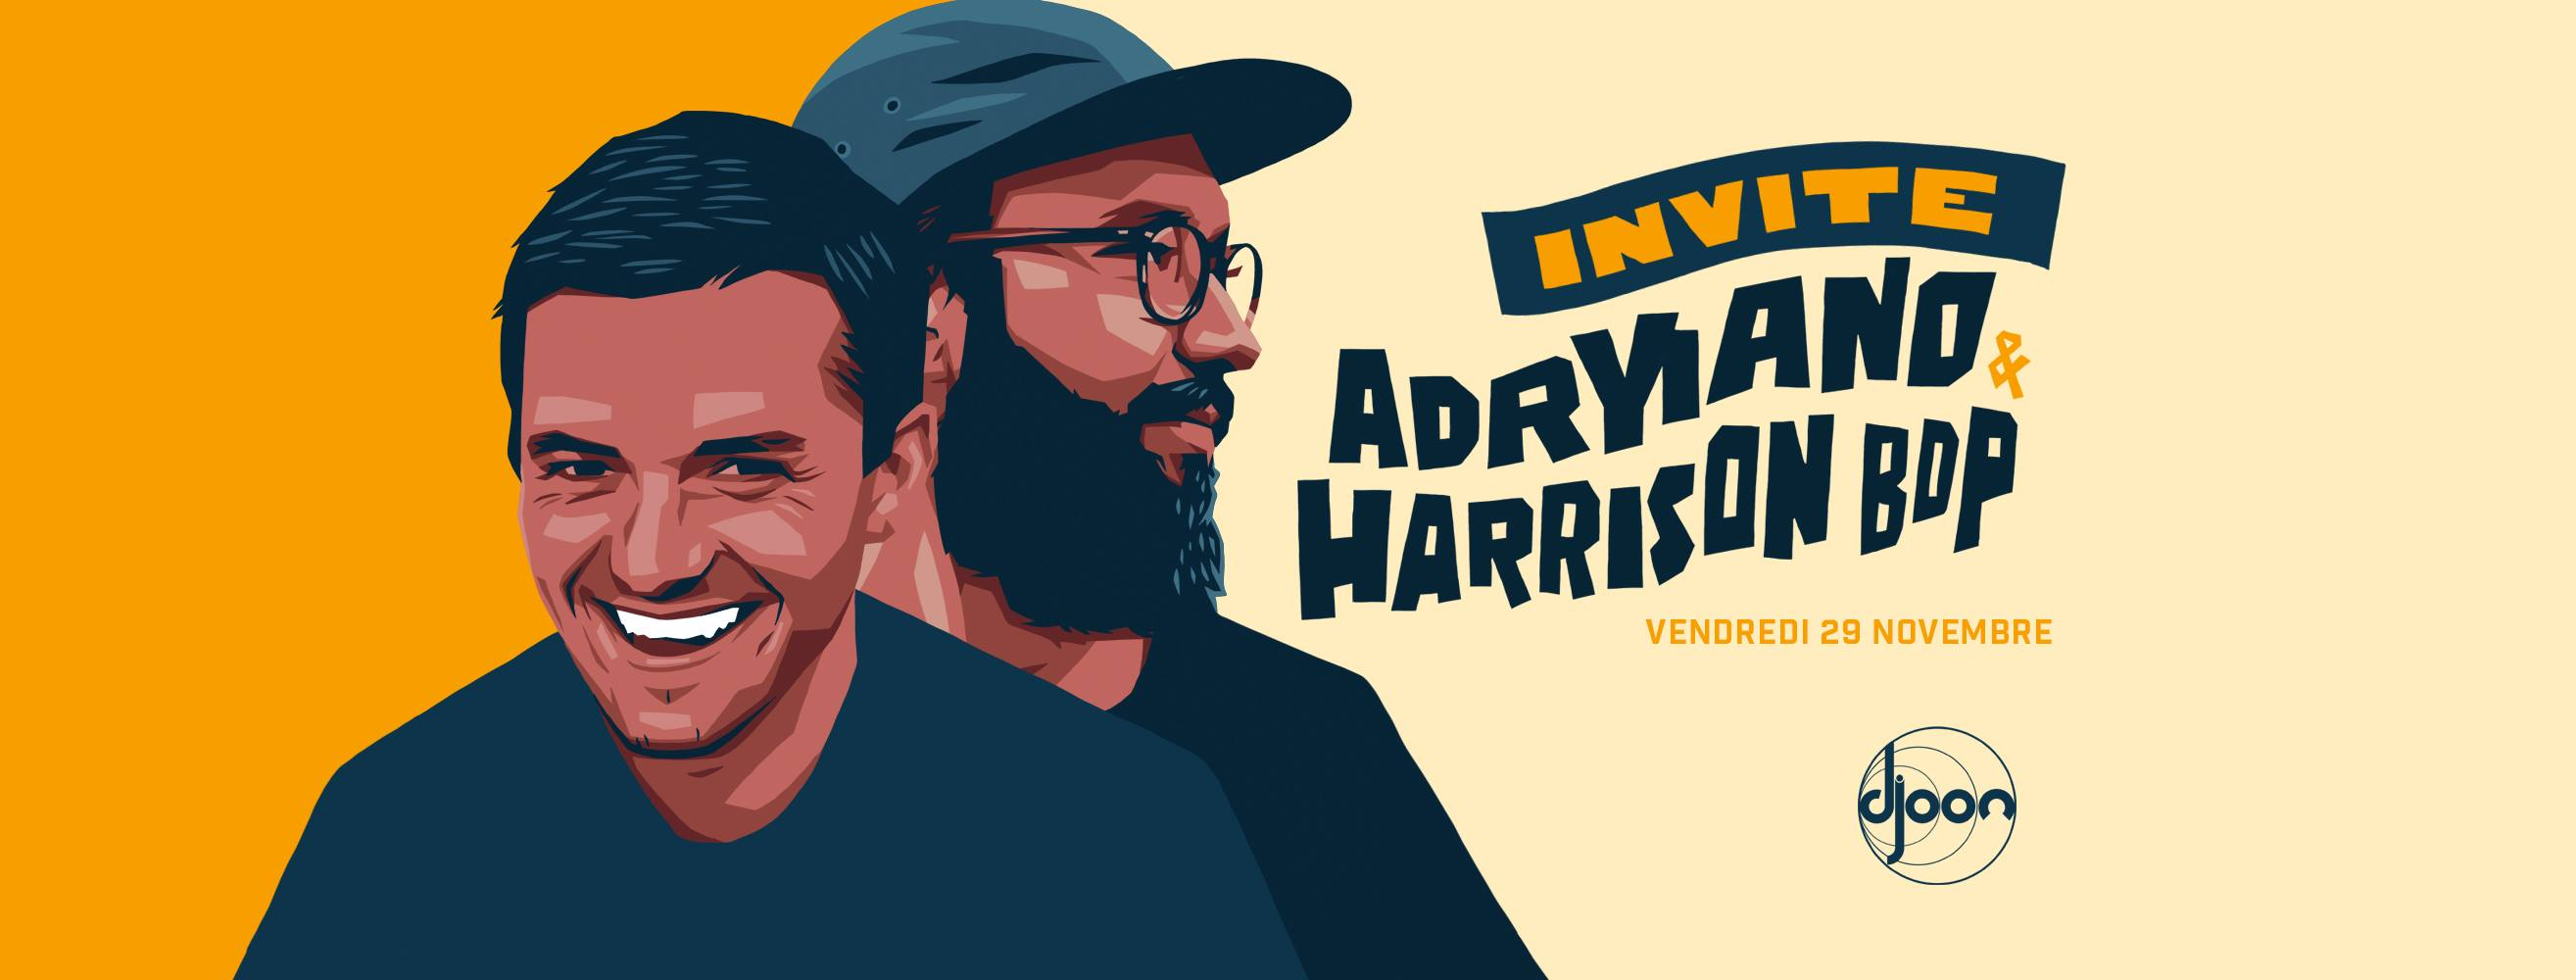 Djoon: Adryiano & Harrison BDP